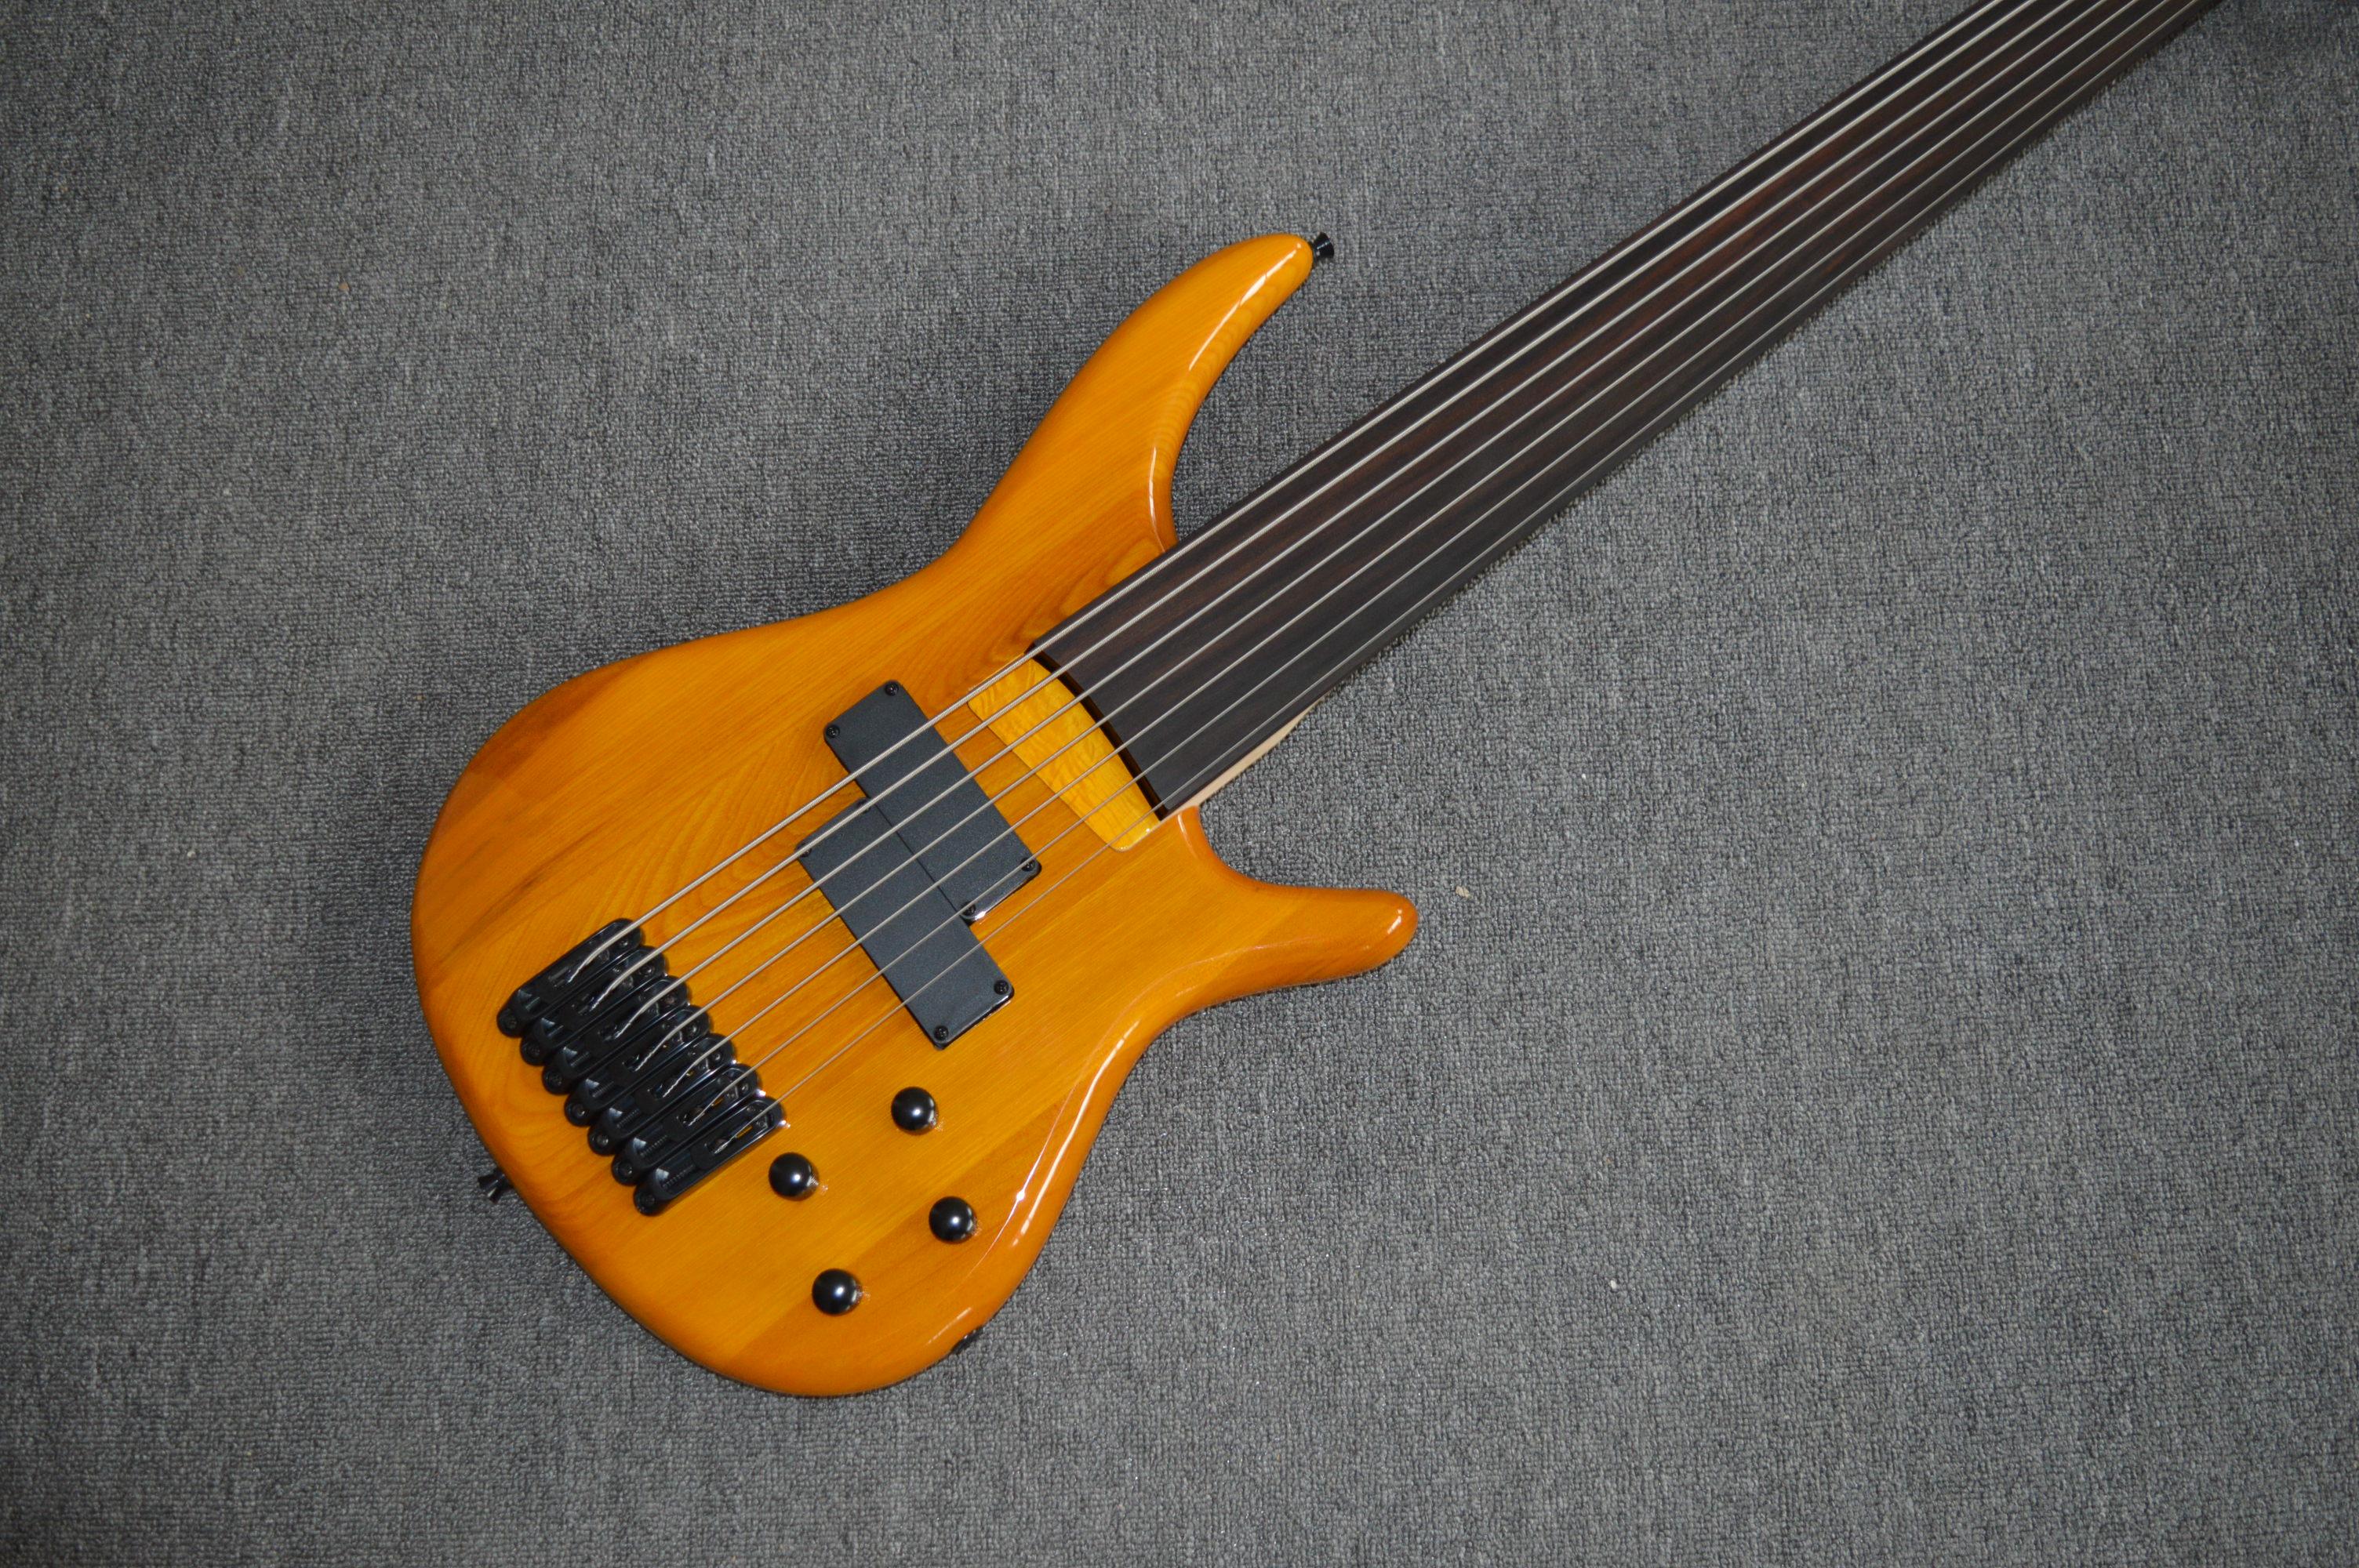 Livraison gratuite basse guitare basse électrique sans fretless 7 cordes guitare basse électrique